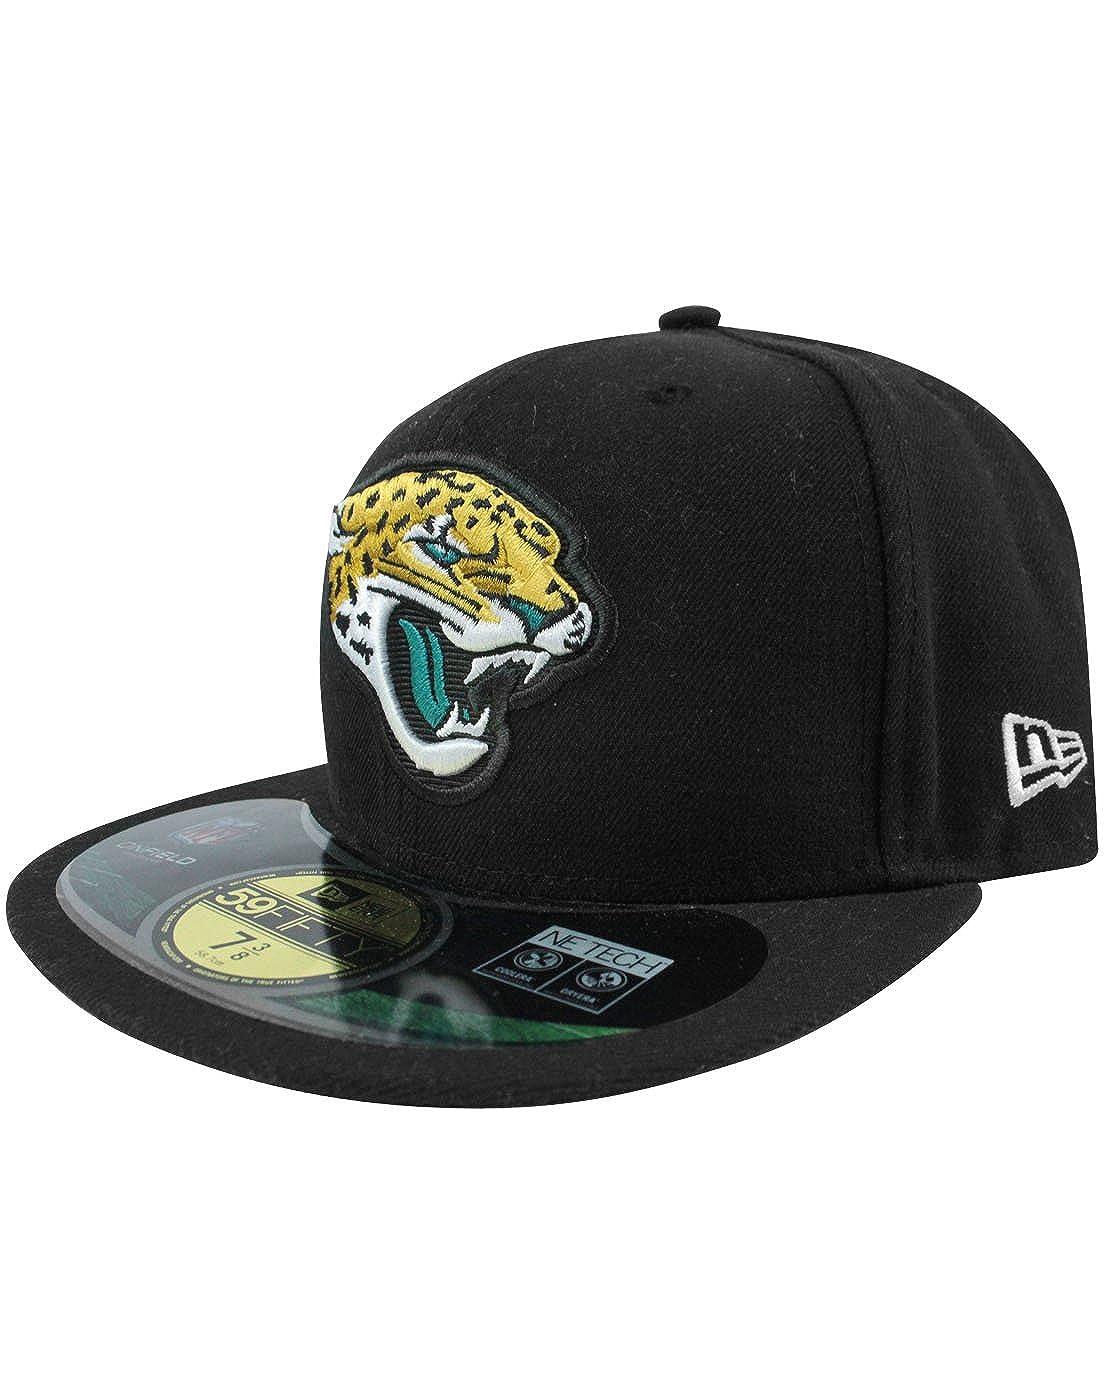 Amazon.com  New Era 59Fifty NFL Jacksonville Jaguars Cap  Clothing 95f4e9c83